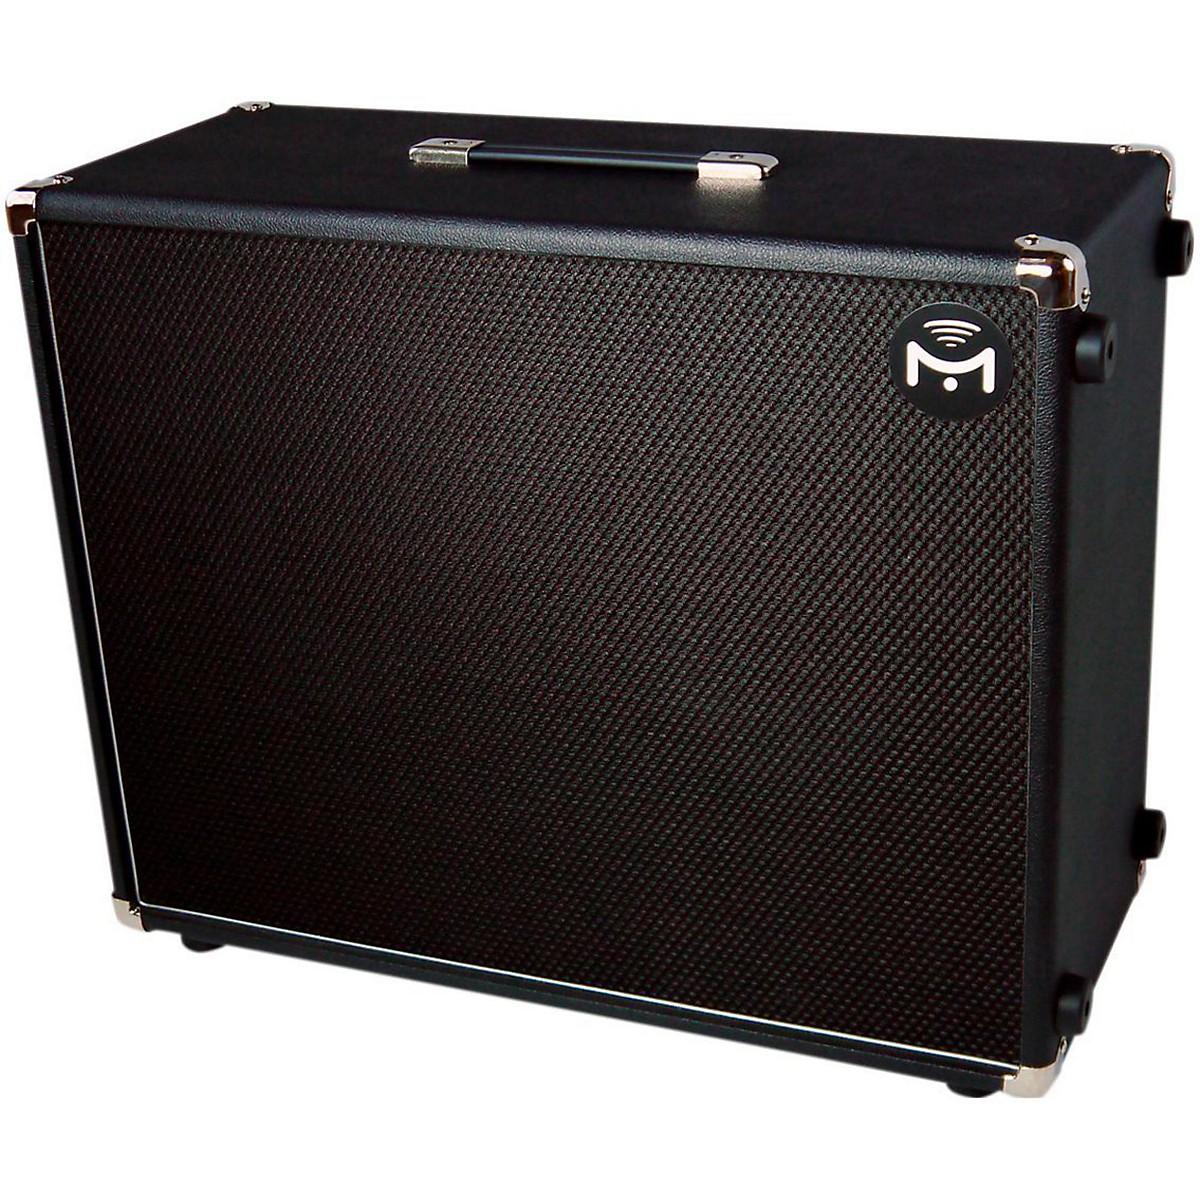 Mission Engineering GM2 Gemini II 2x12 220W Guitar Cabinet